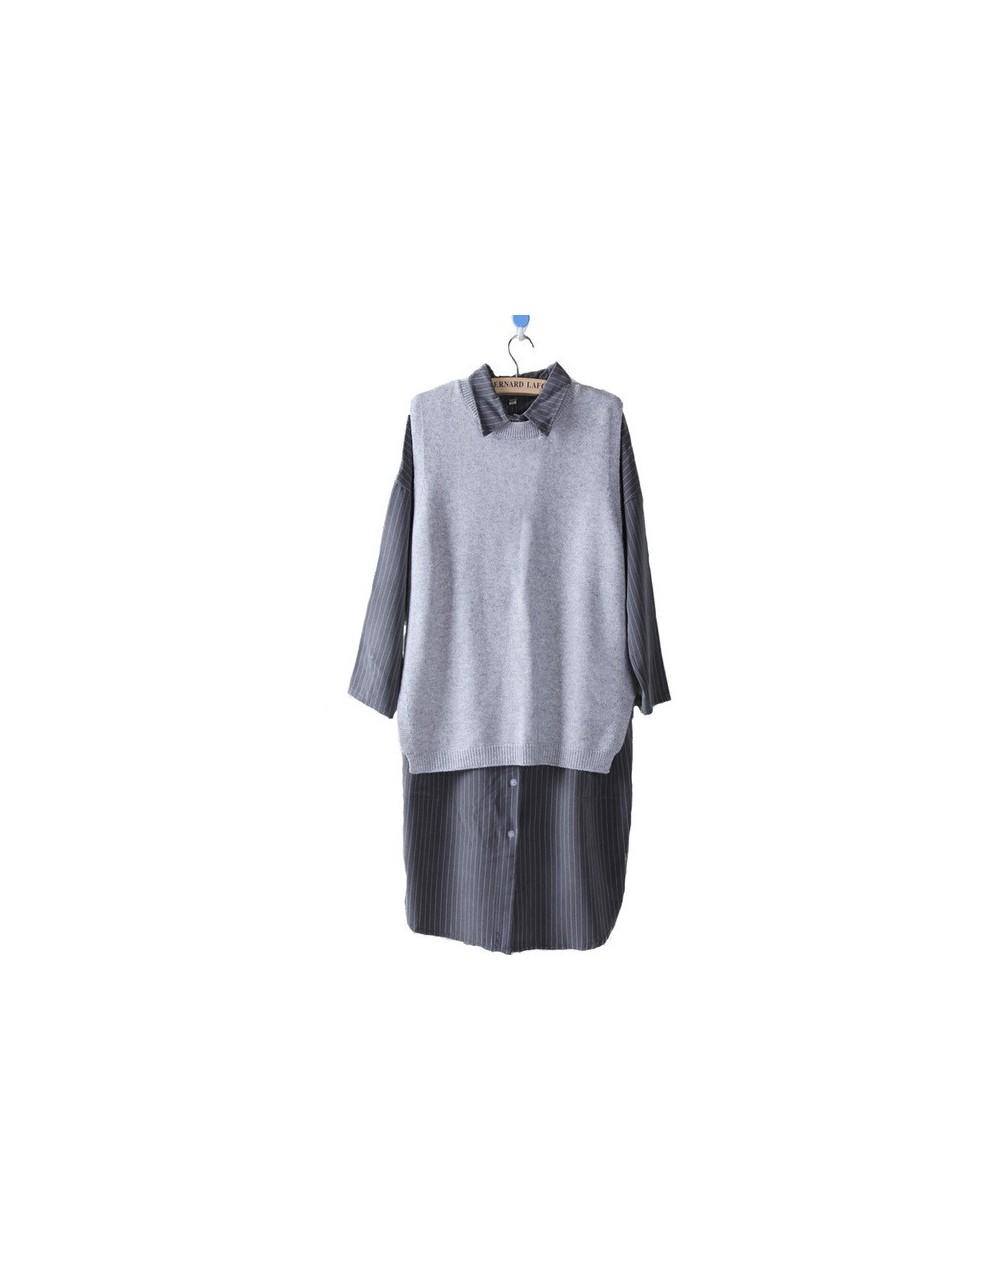 2019 vest for women spring autumn Cashmere Vest Sweater female loose Vest Women Thin Fashion Knit Sweater waistcoat jacket -...